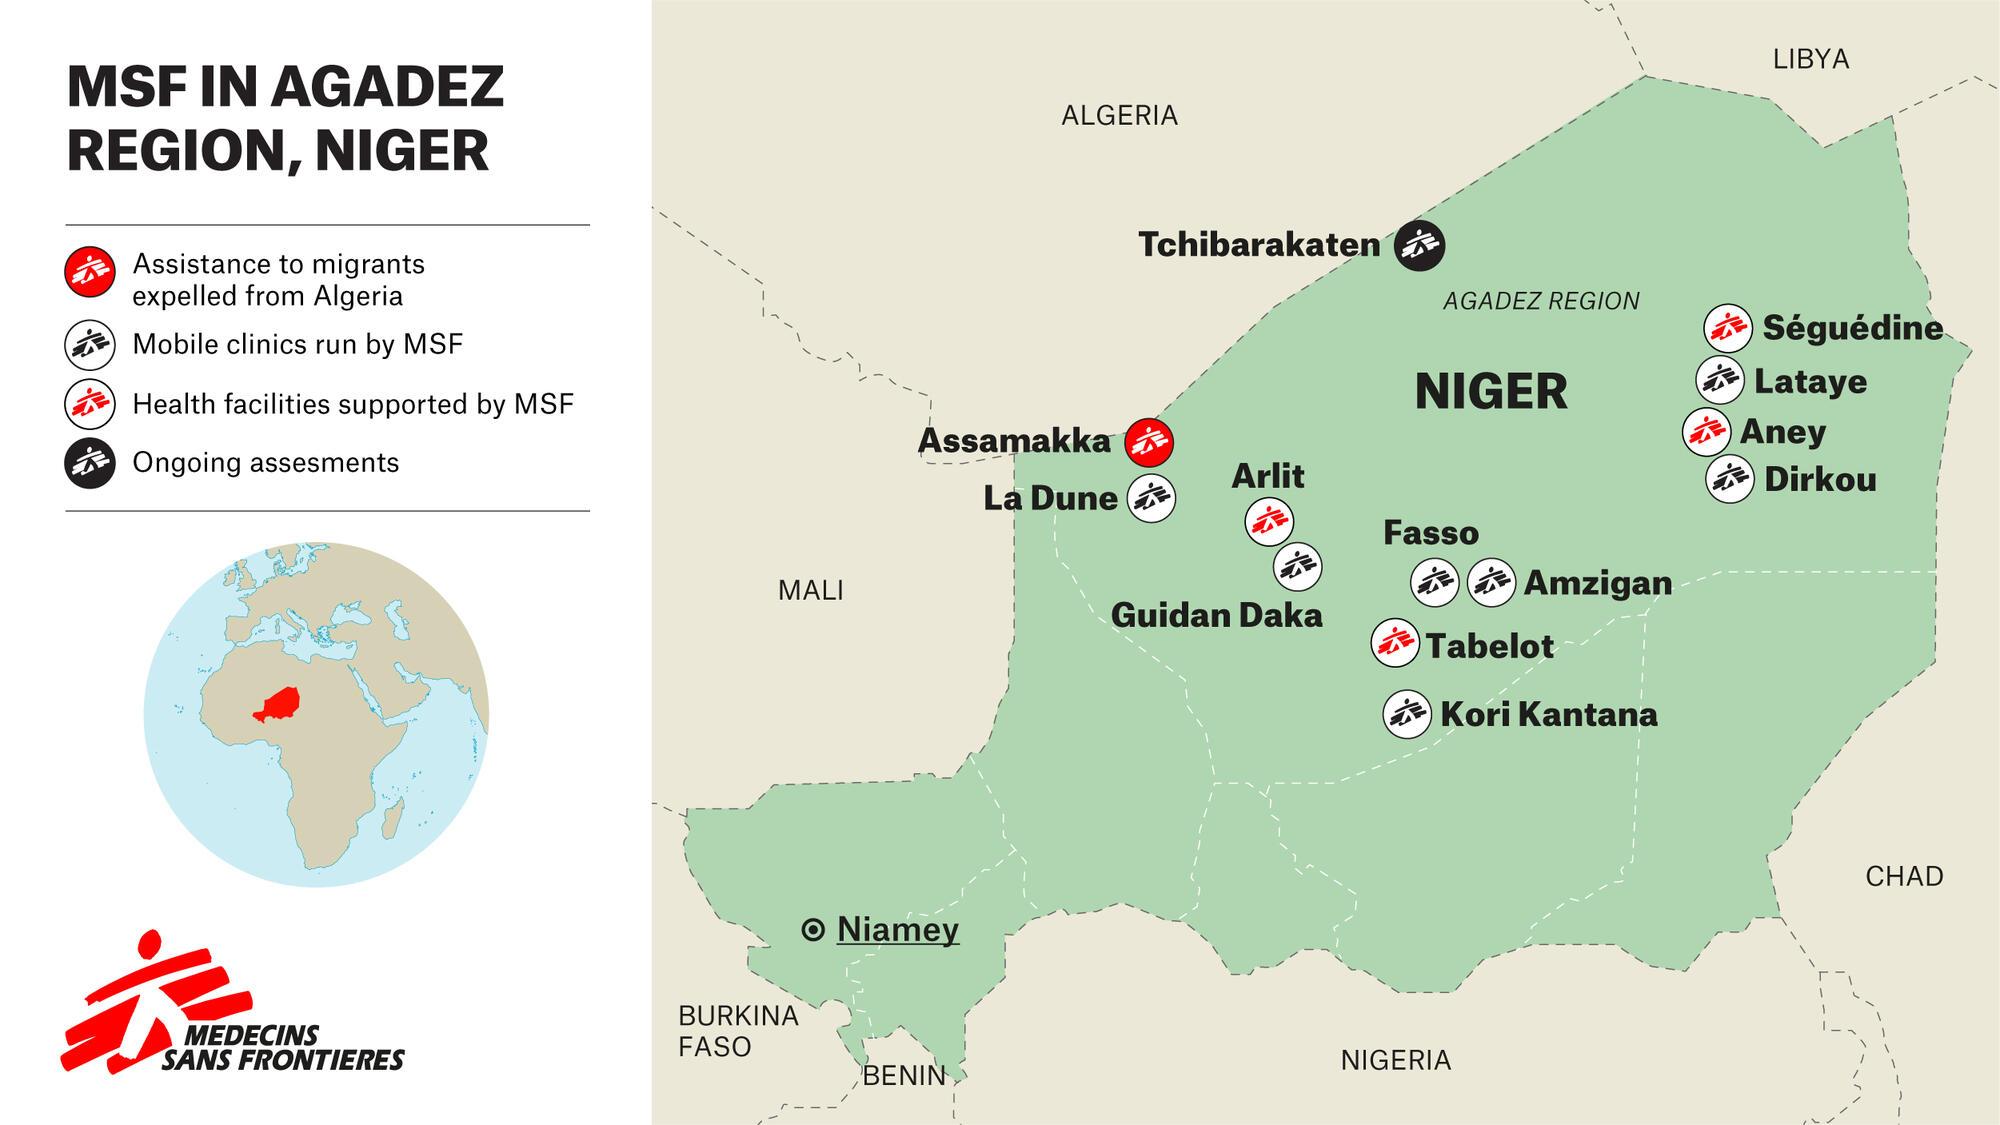 MSF in Agadez region, Niger - Map - ENG